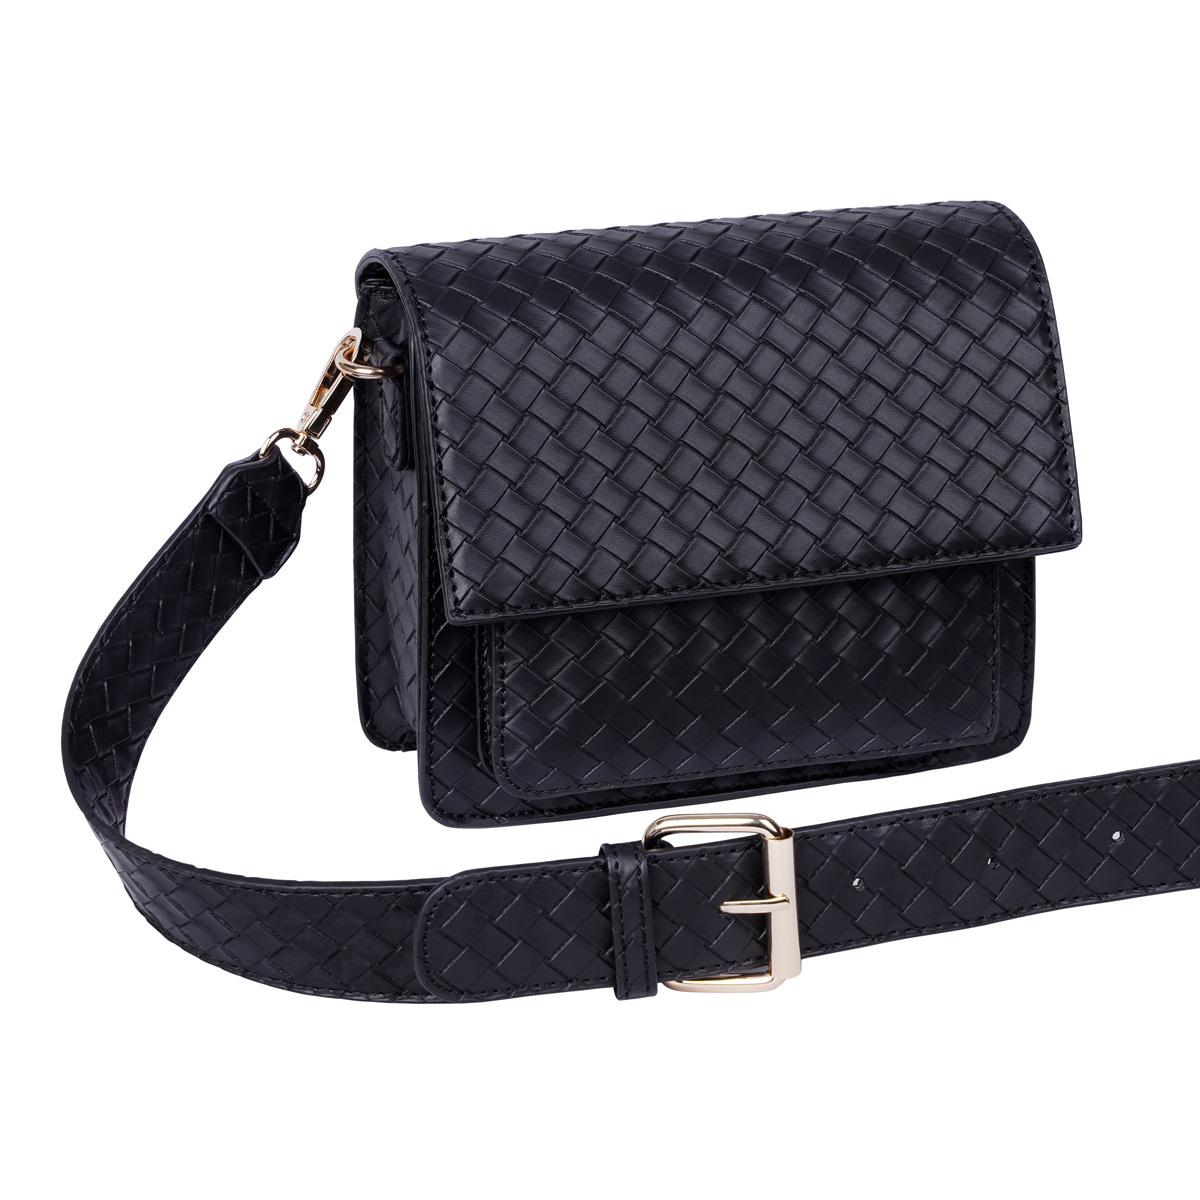 With love Bag braided  Black 18cm x 15cm